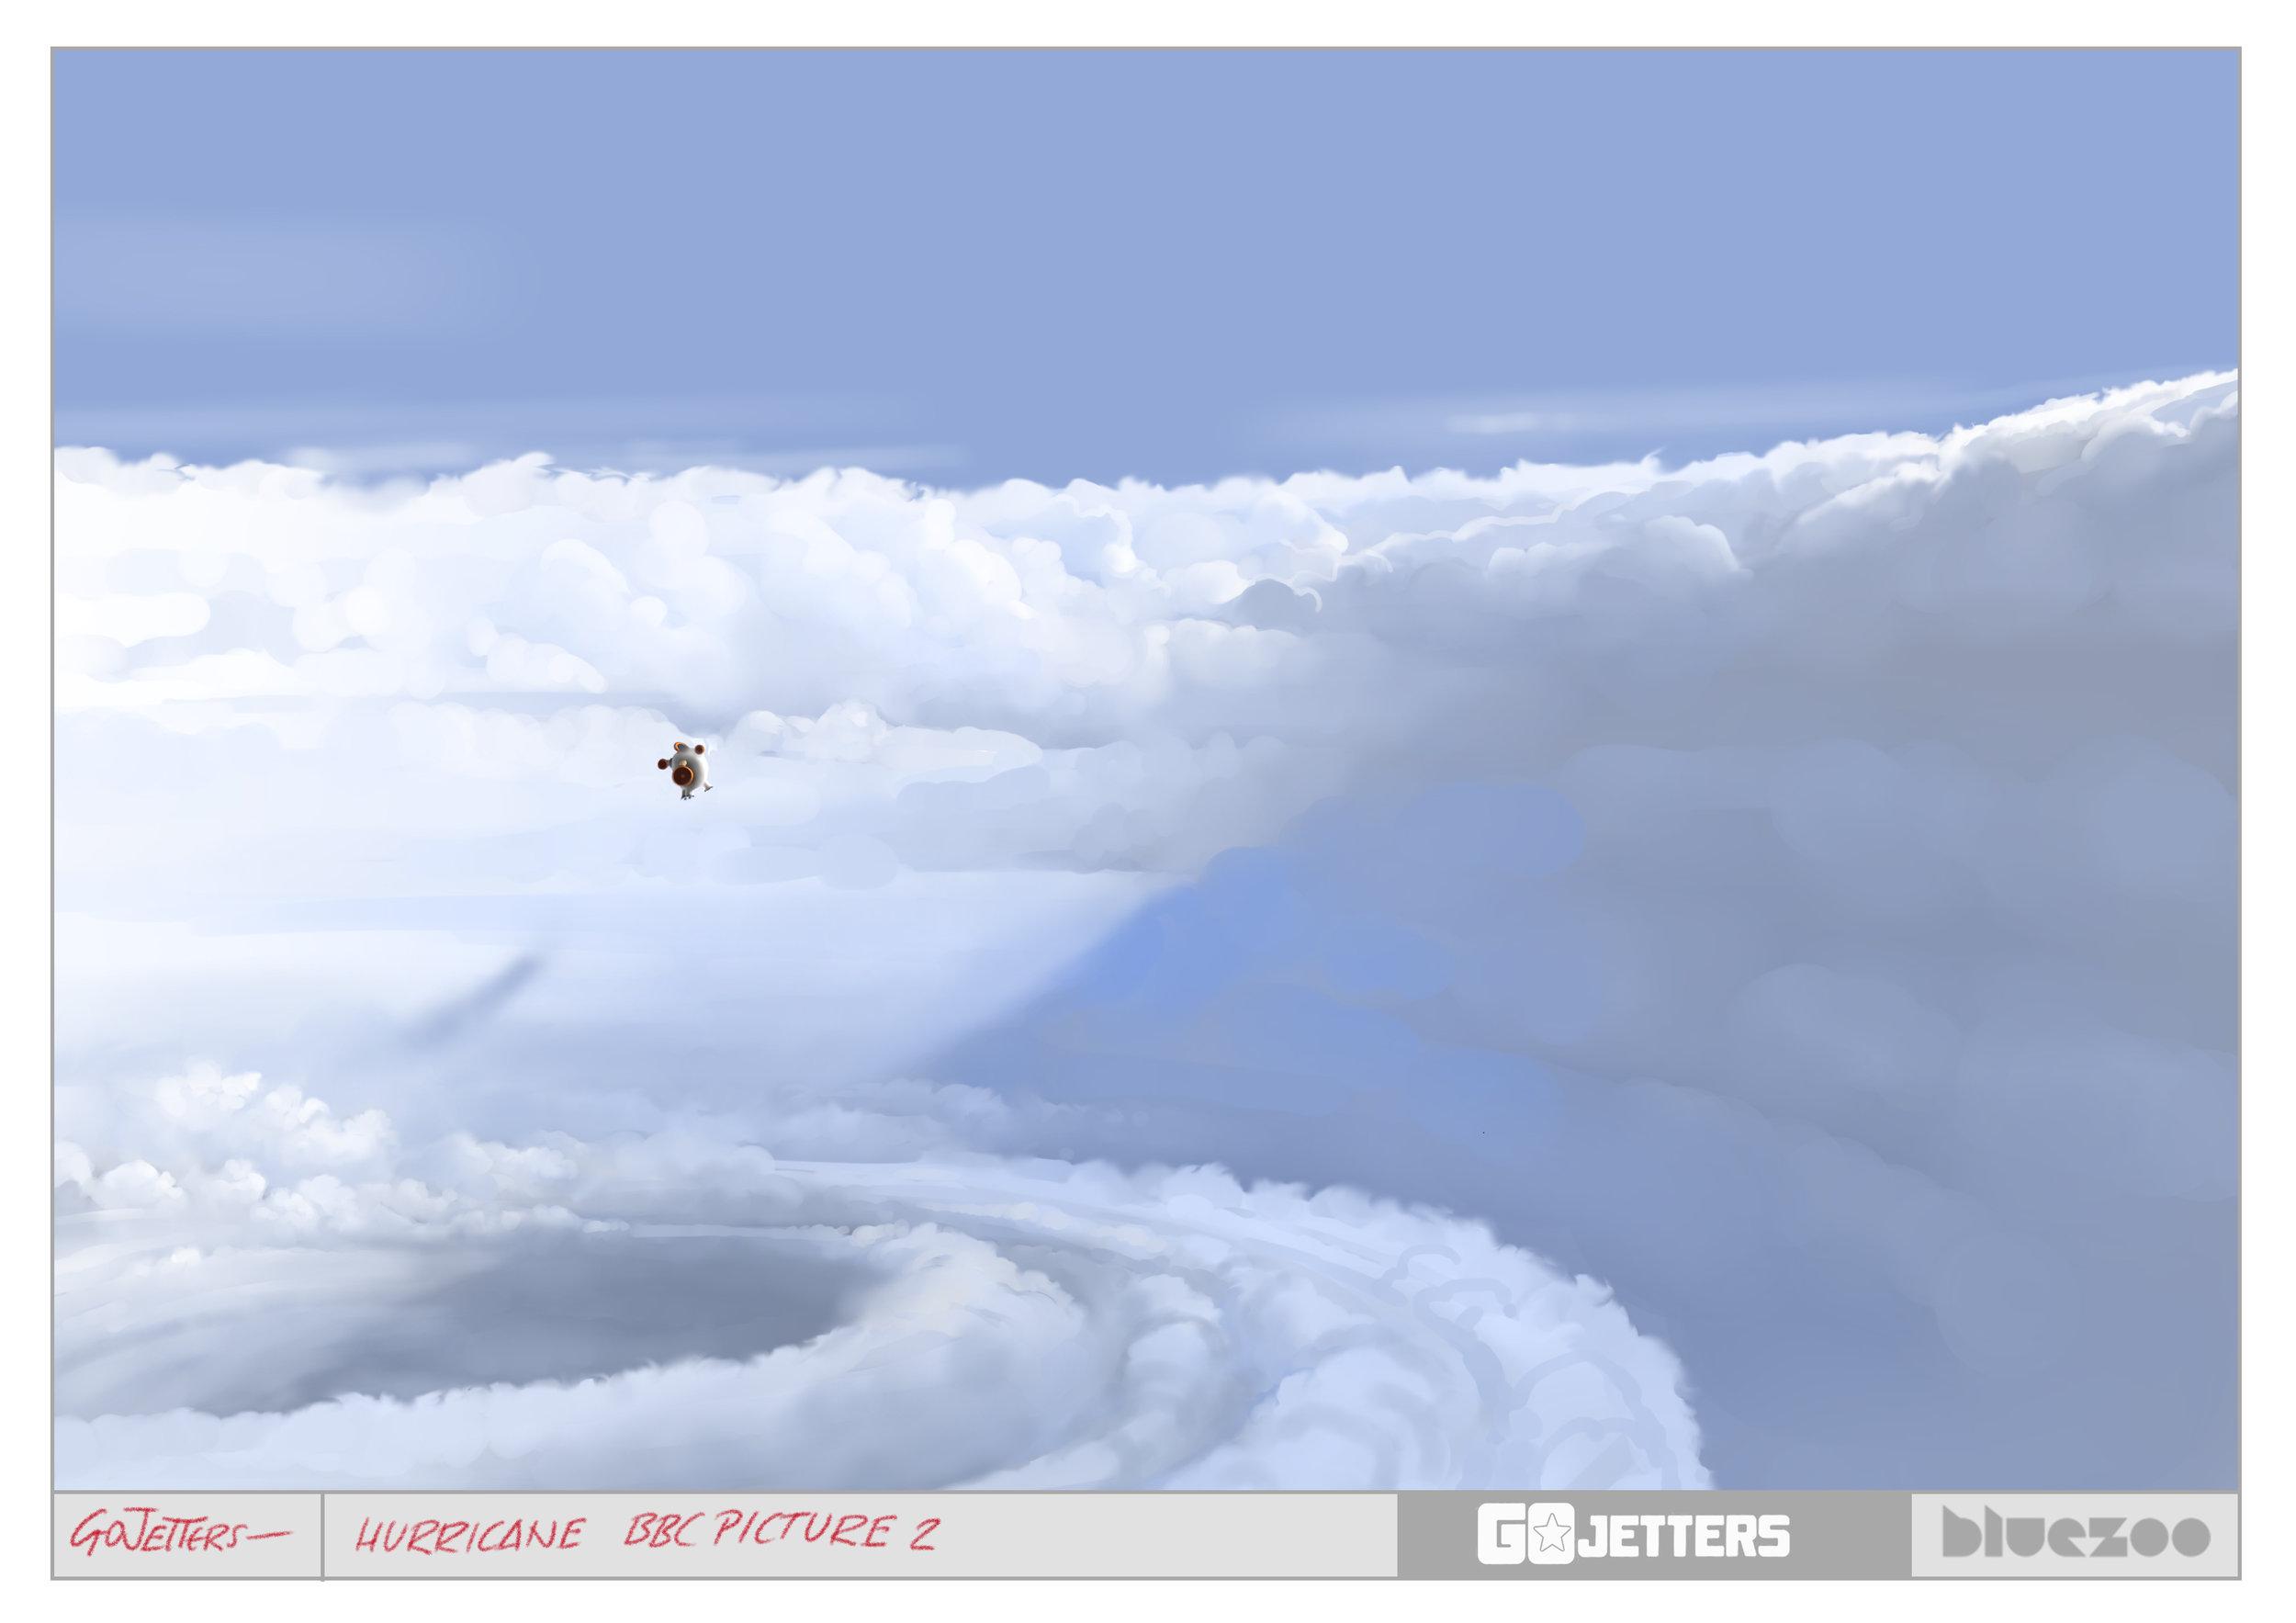 Hurricane_BBCPicture_03.jpg